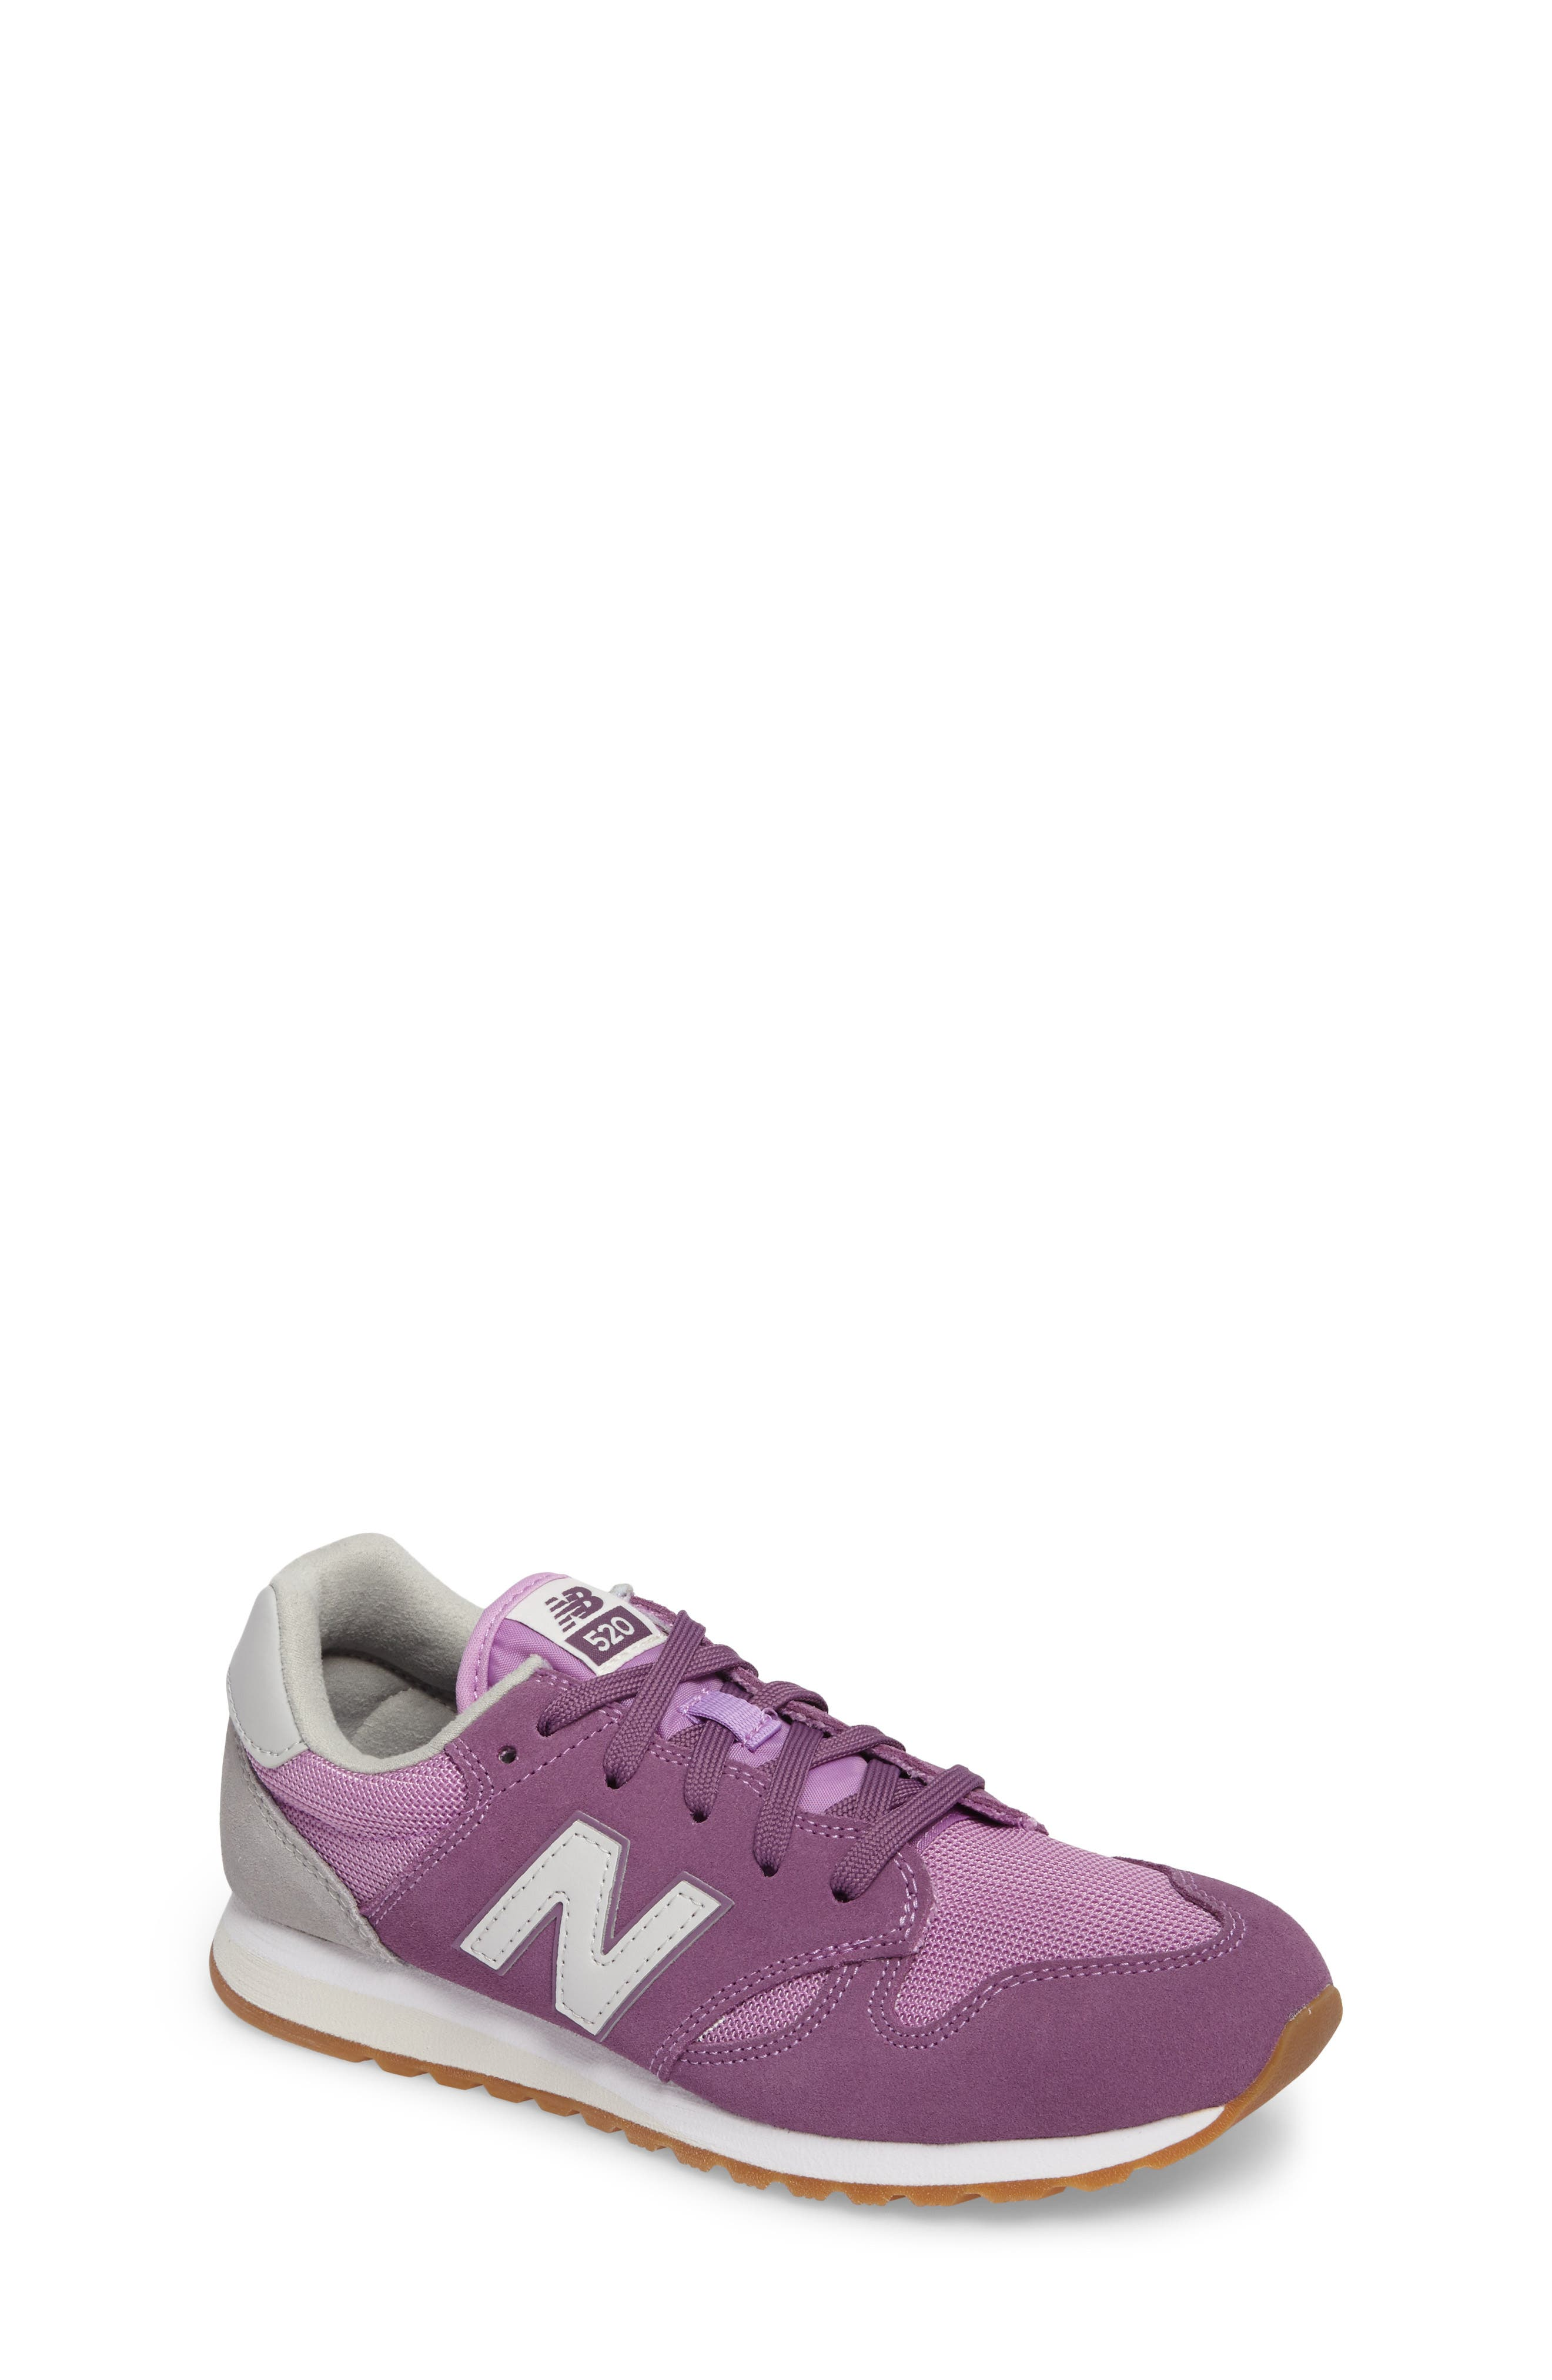 520 v4 Sneaker,                             Main thumbnail 1, color,                             557